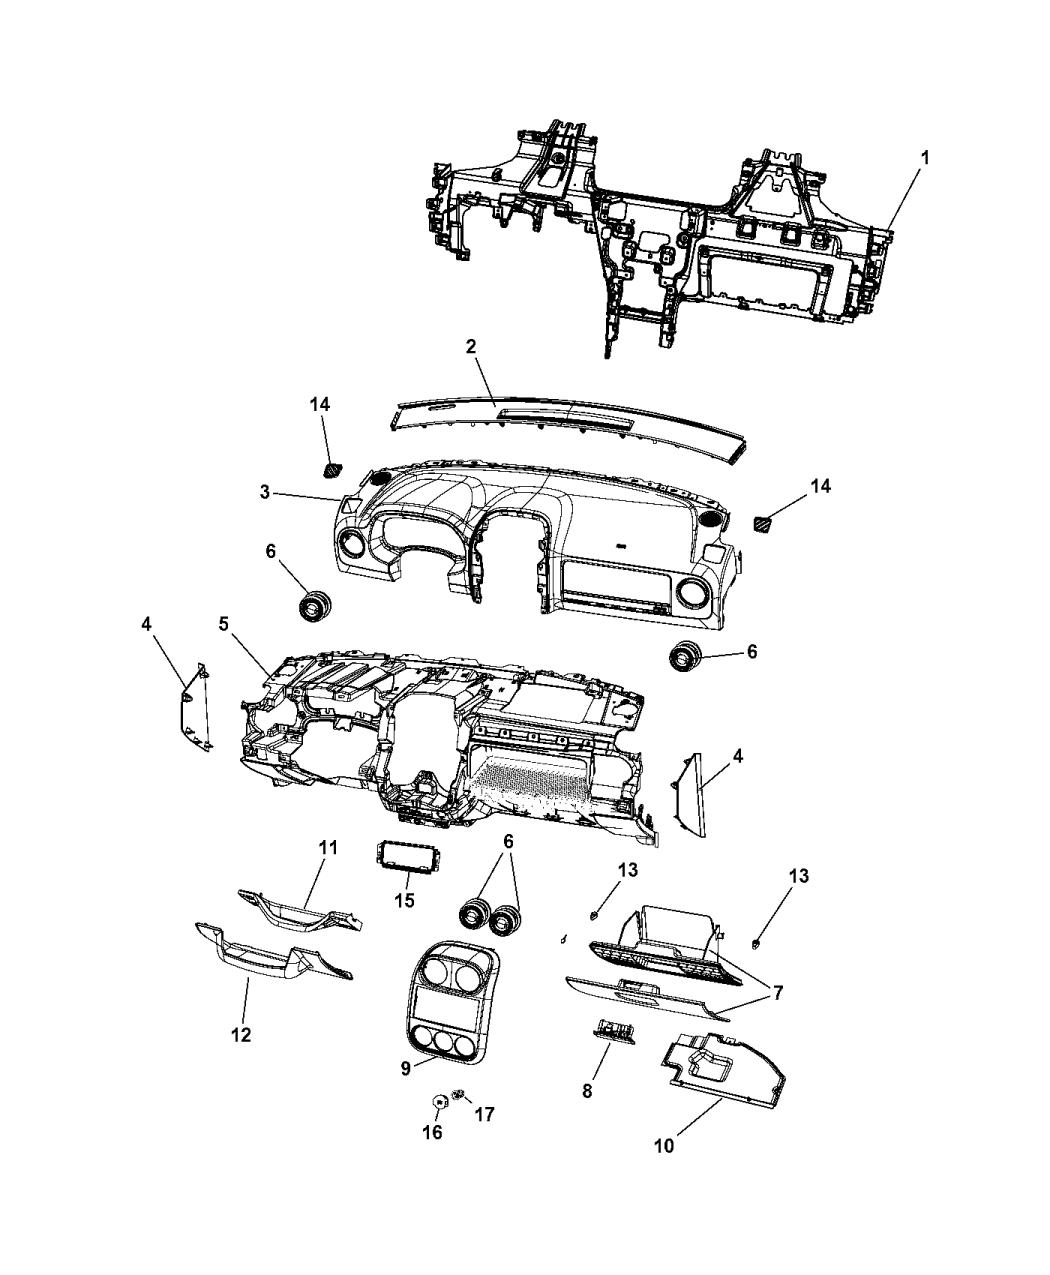 1hm51xdvac genuine jeep cover instrument panel. Black Bedroom Furniture Sets. Home Design Ideas